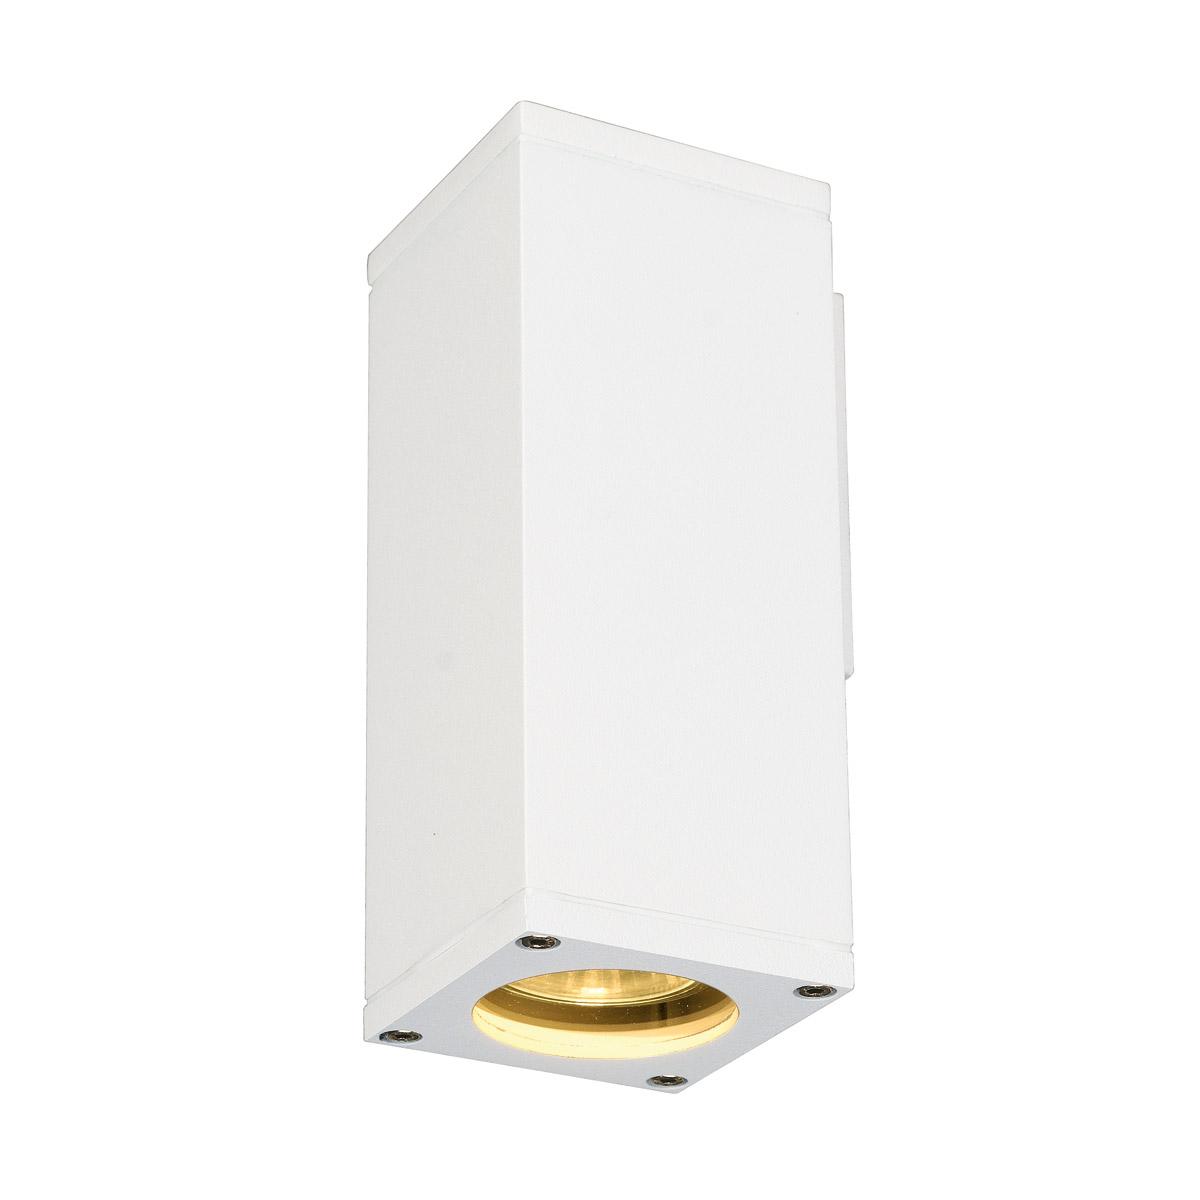 THEO WALL OUT WALL LUMINAIRE, GU10, max. 35W, angular, white